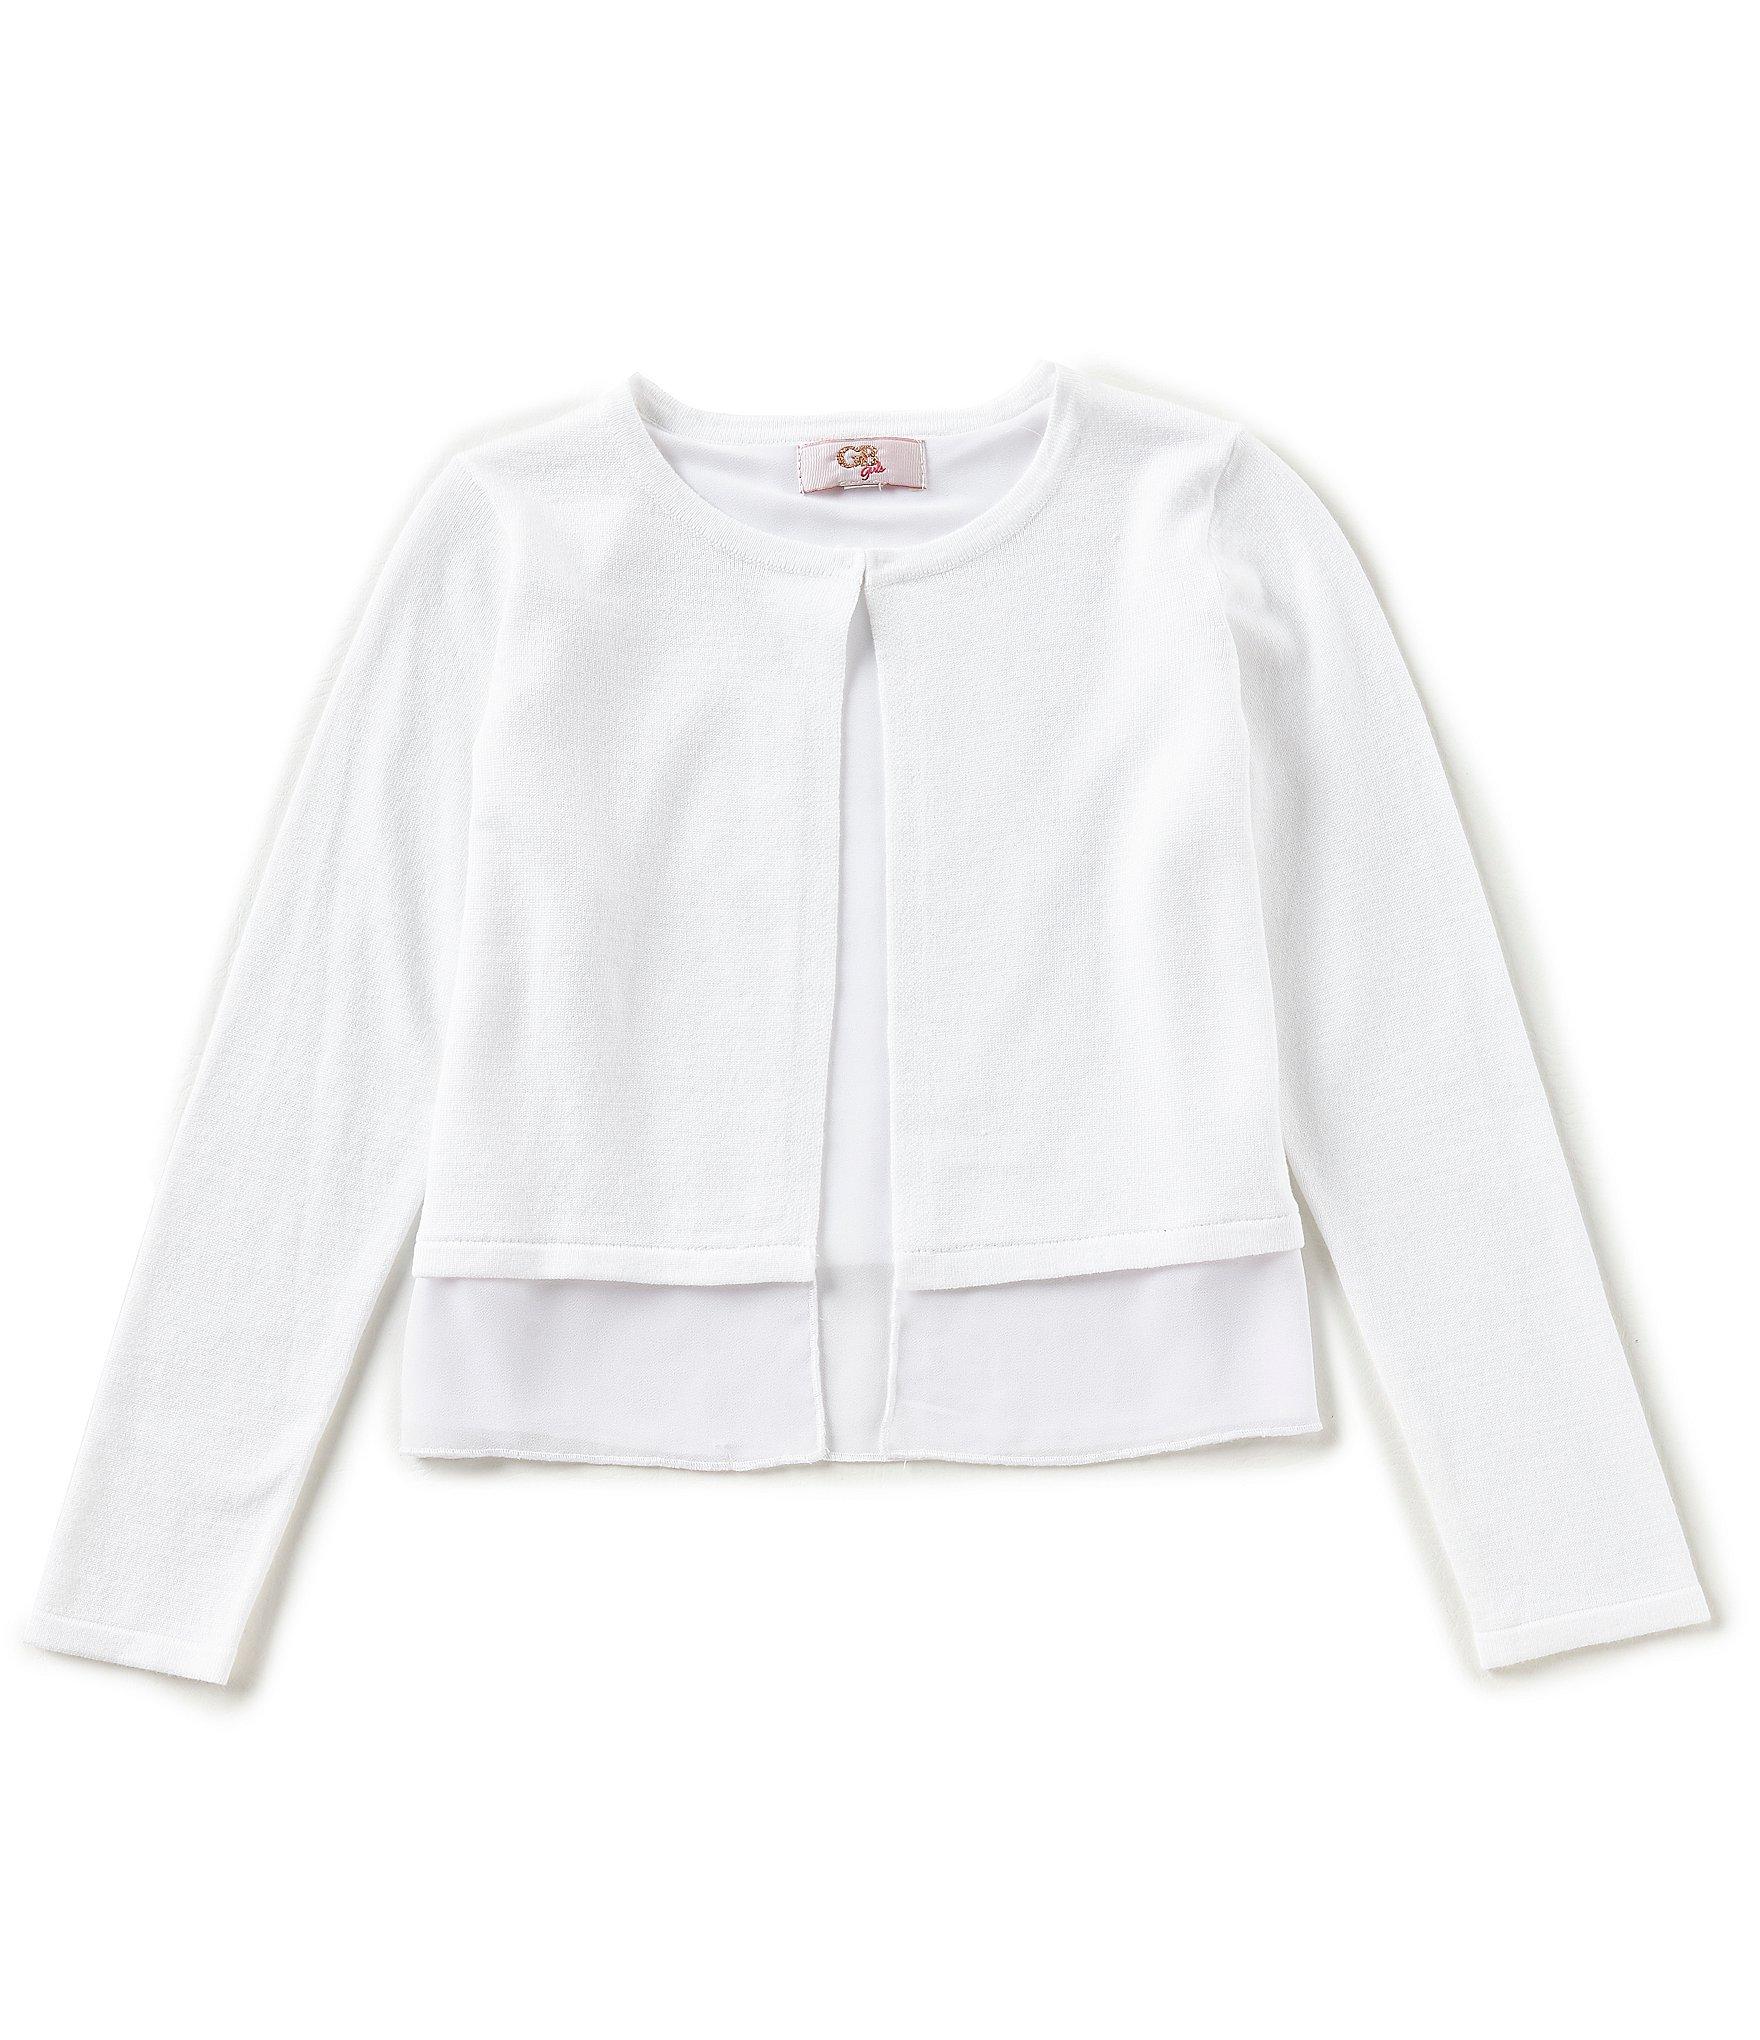 d4873b9bd5d3a9 Girls' Sweaters & Cardigans   Dillard's